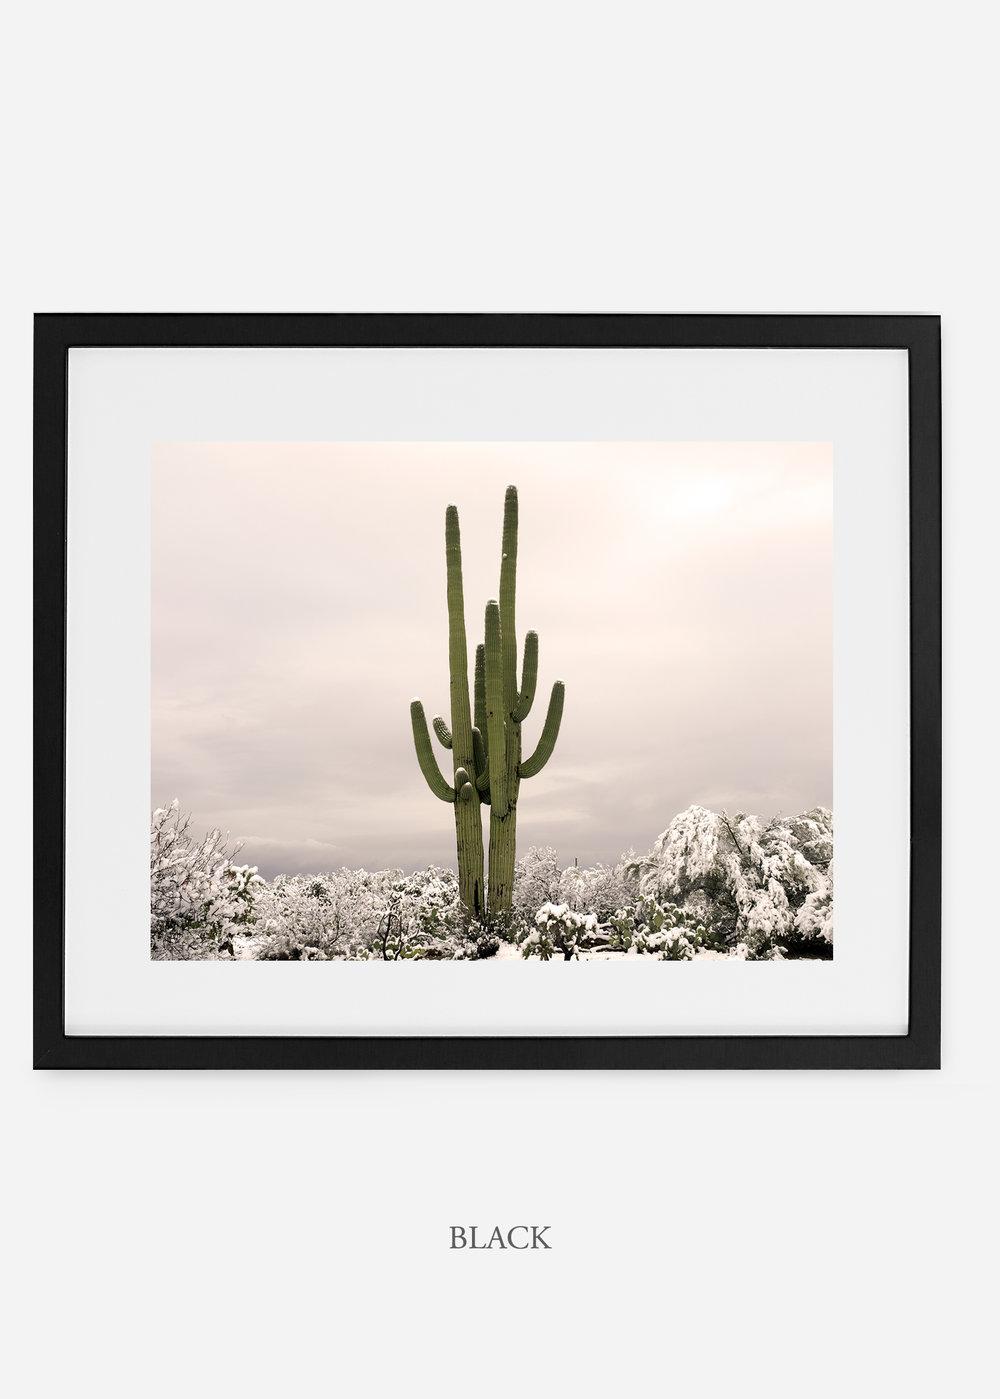 blackframe-saguaroNo.5.-wildercalifornia-art-wallart-cactusprint-homedecor-prints-arizona-botanical-artwork-interiordesign.jpg